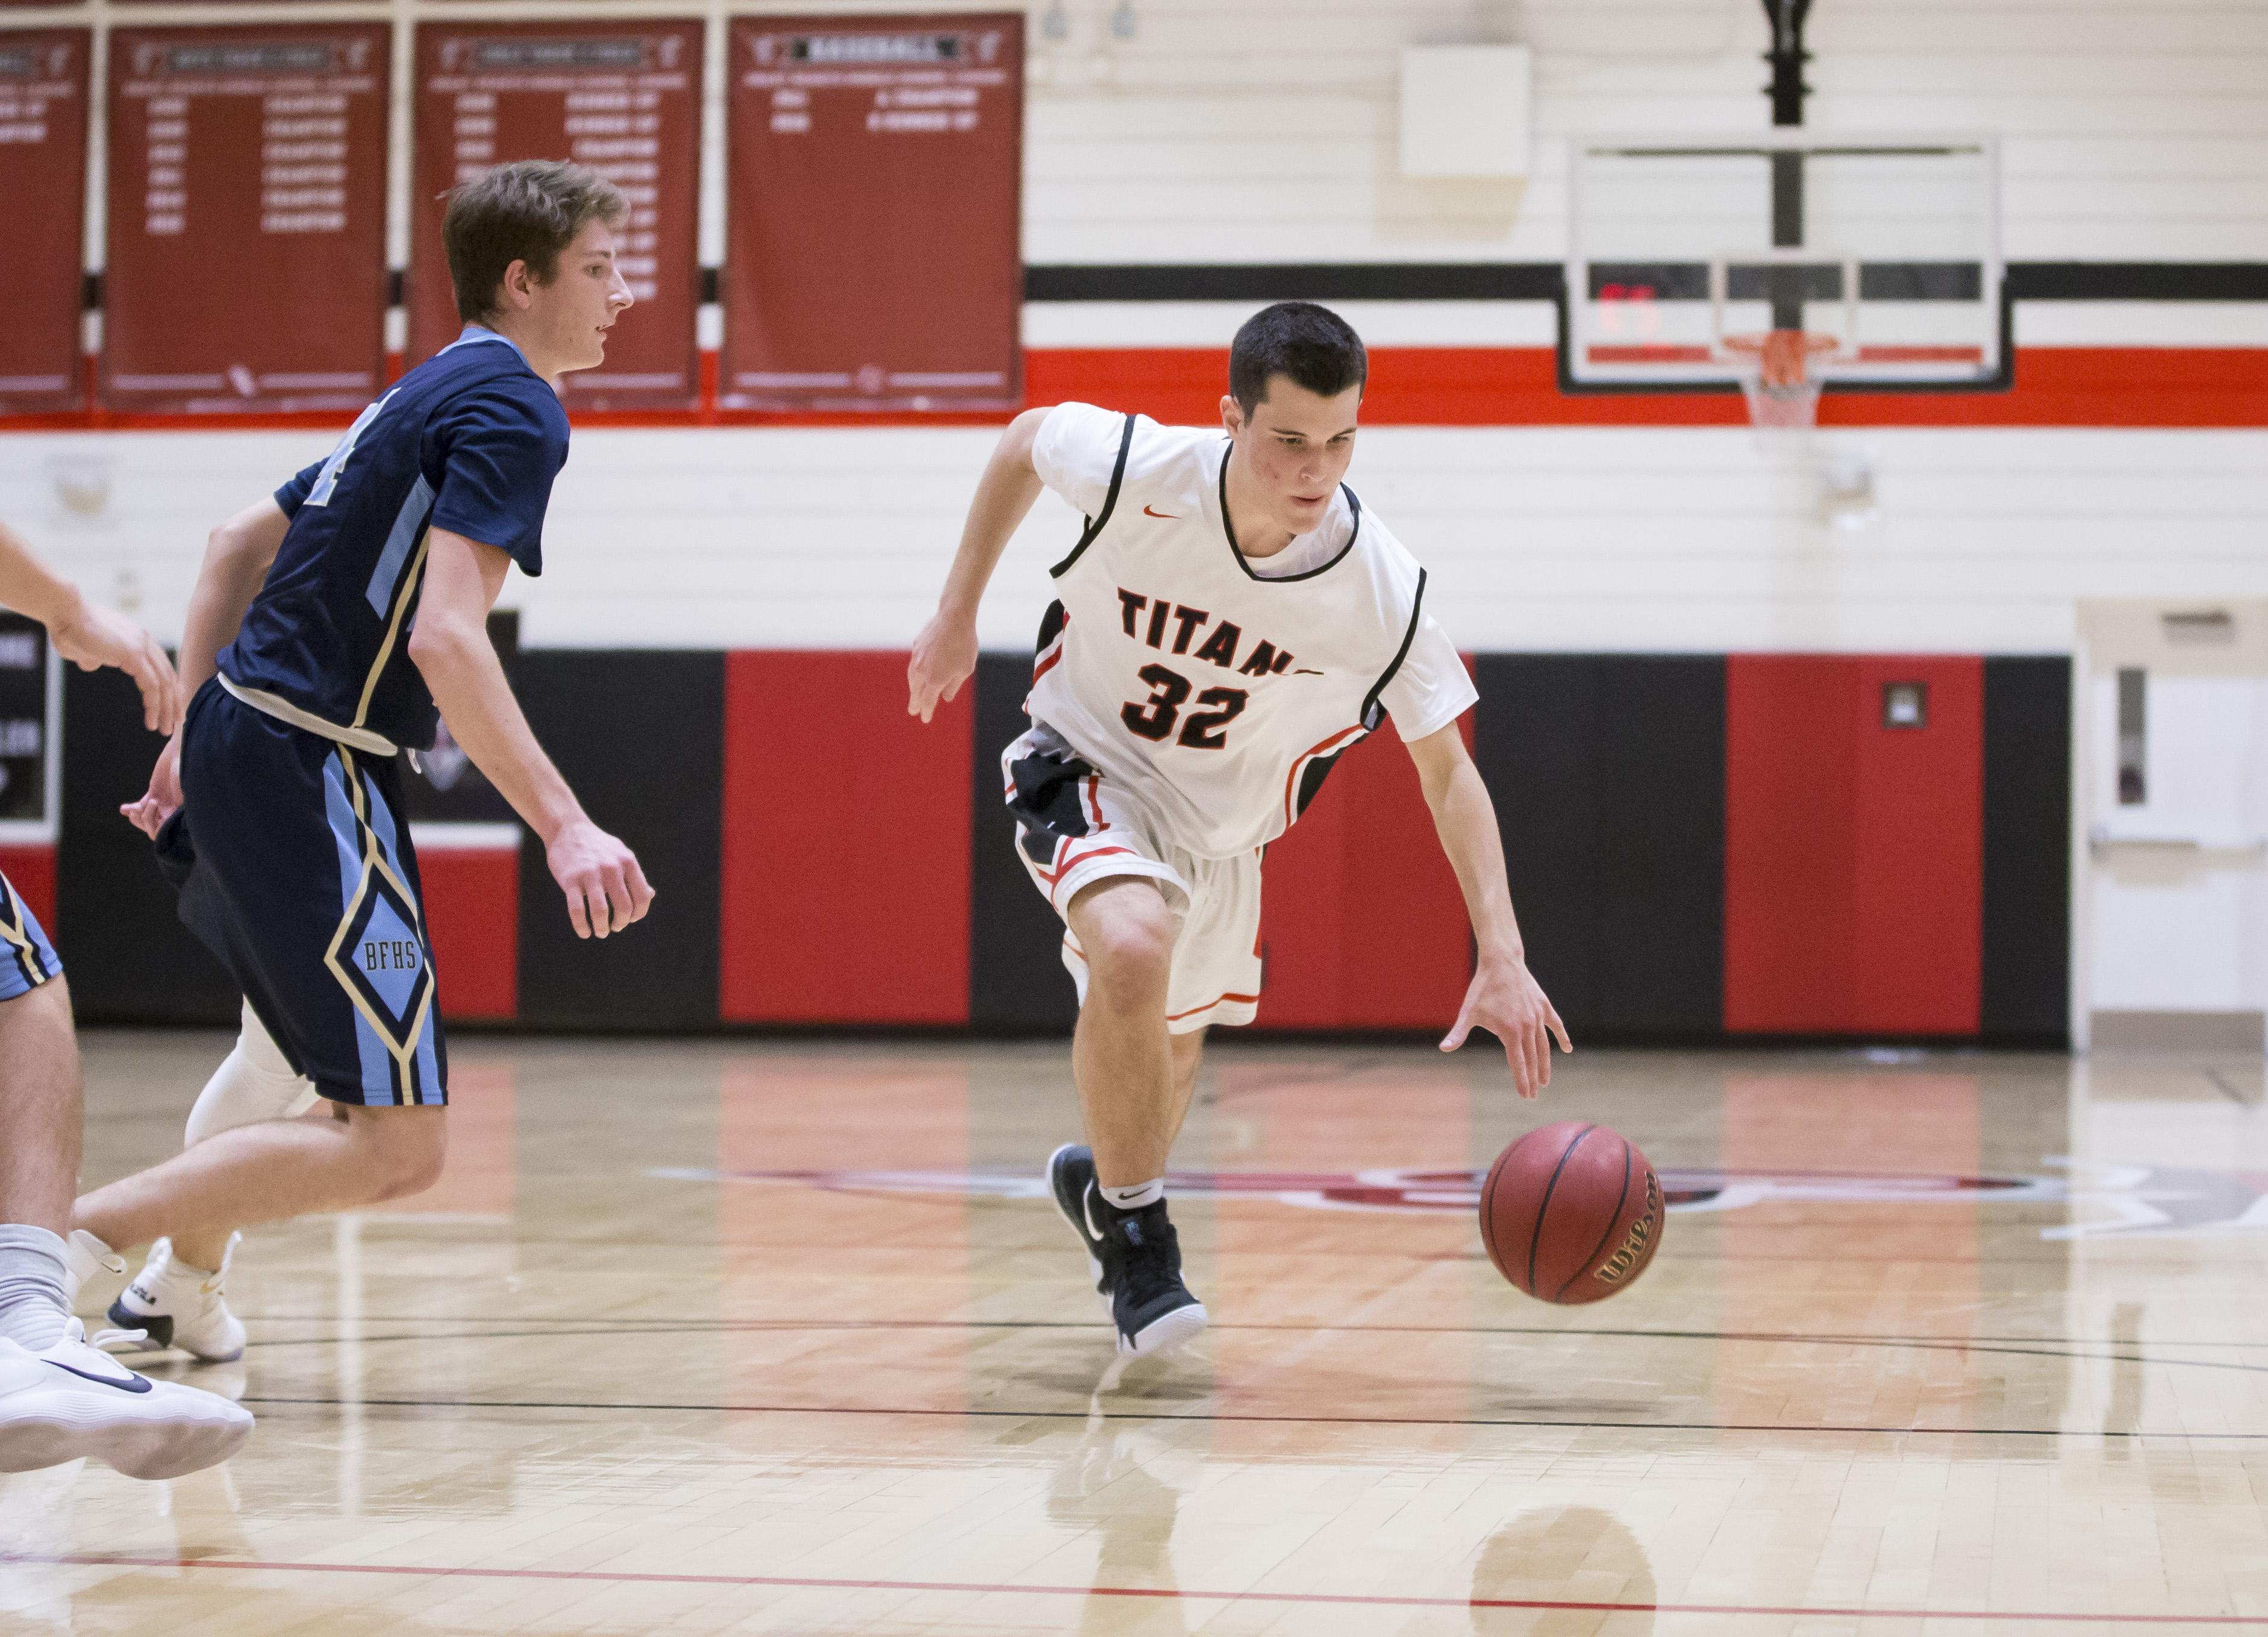 Mens Basketball Fall Practice Begins This Saturday 8/18